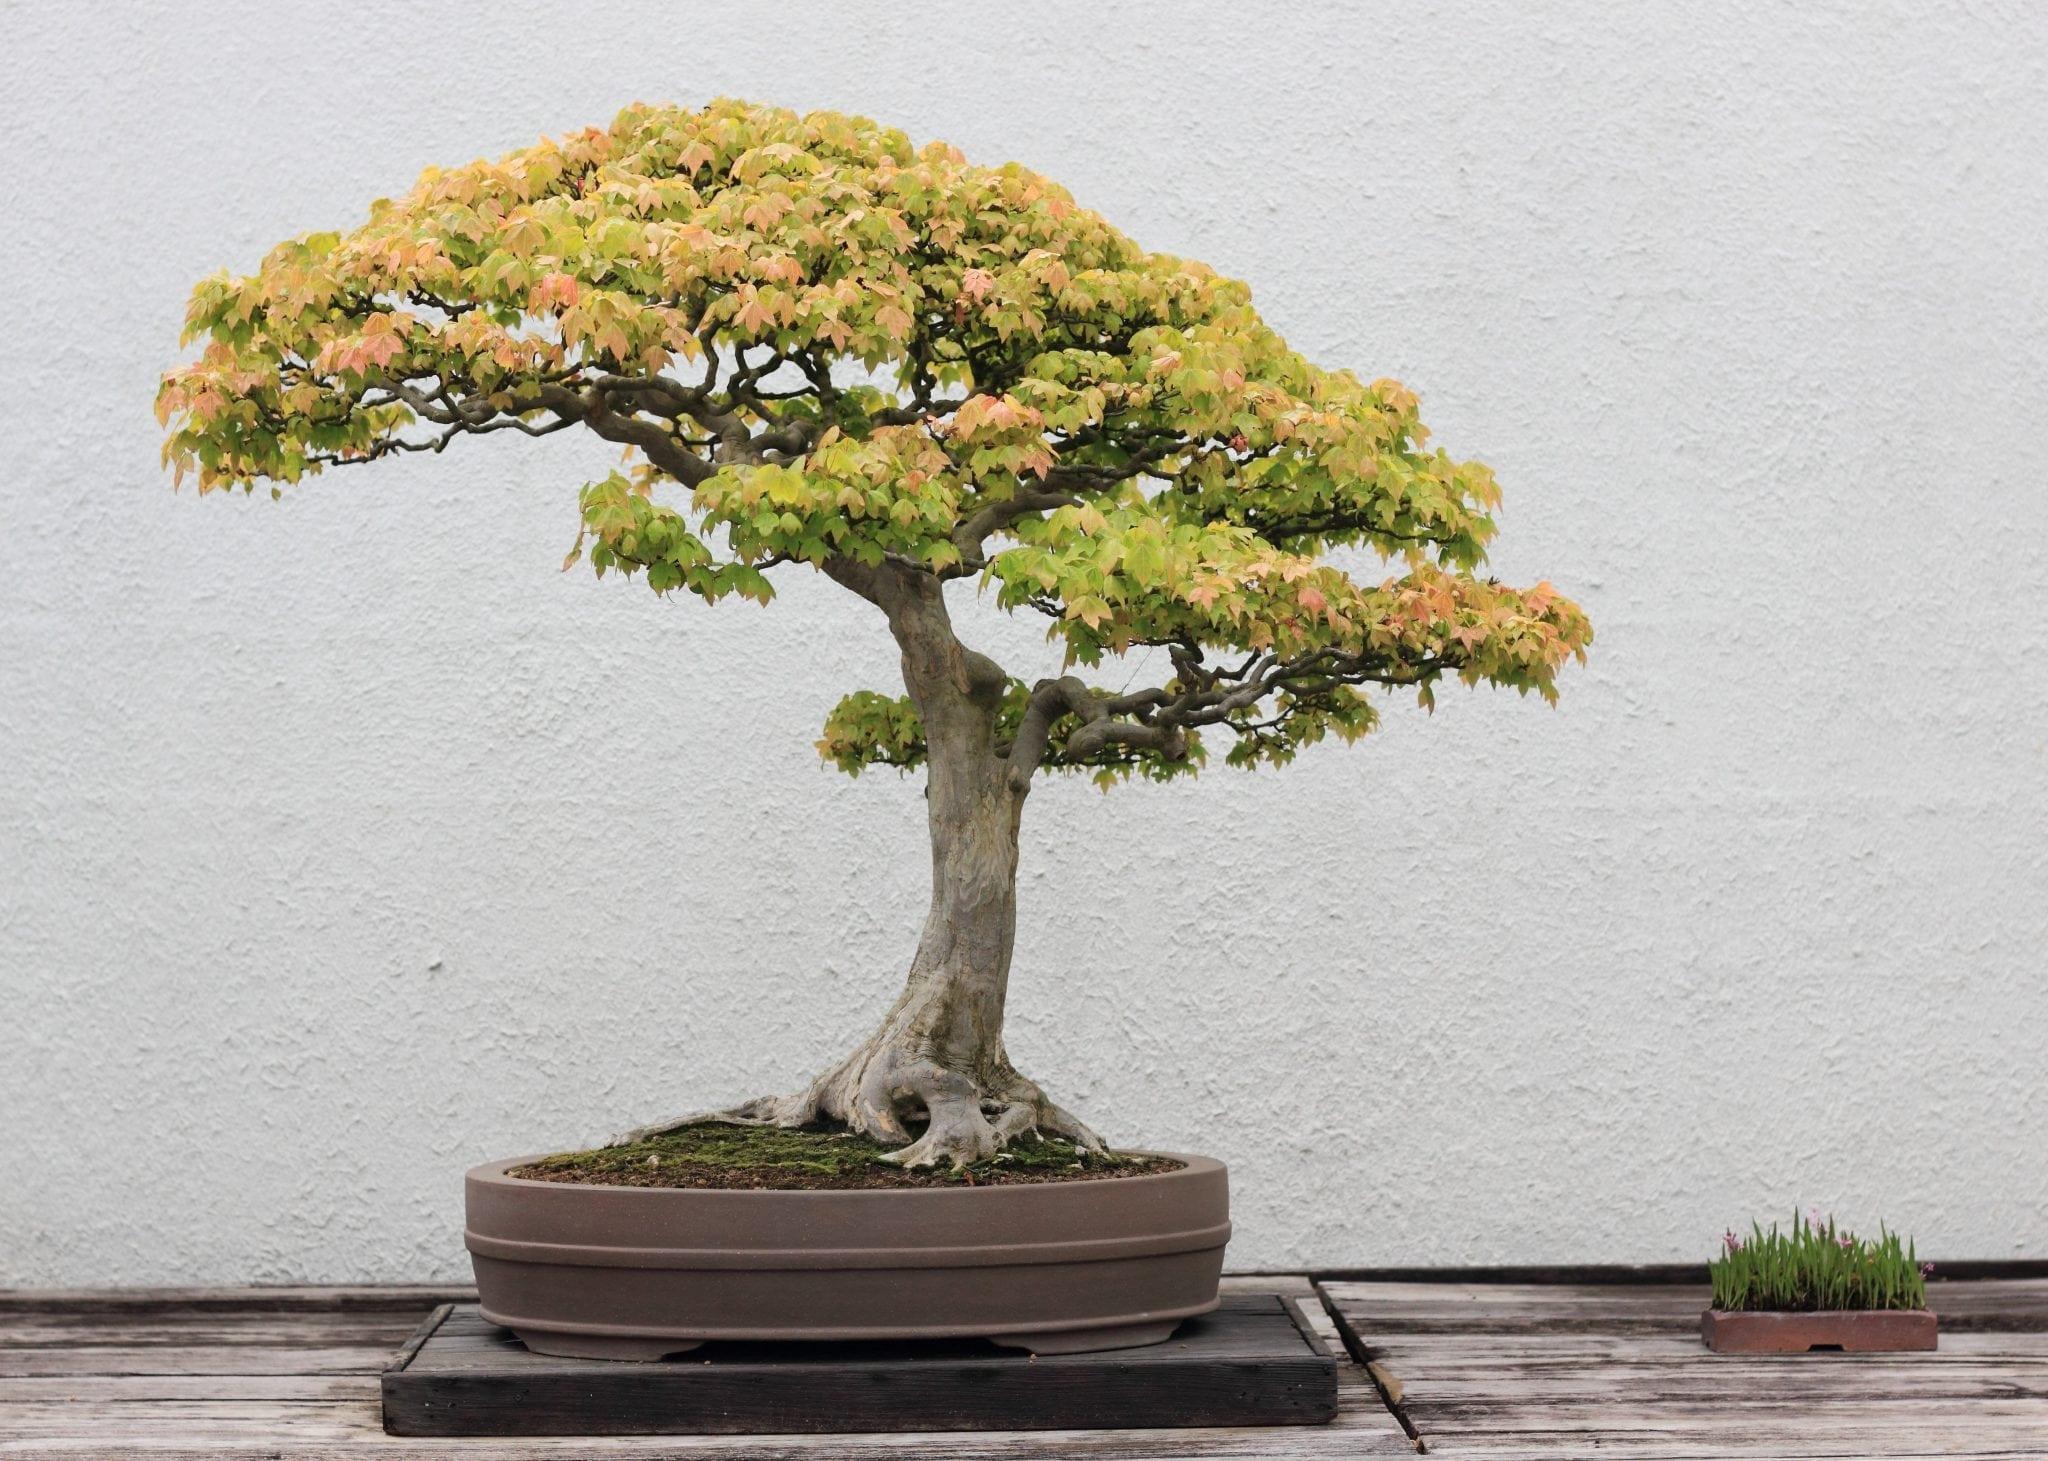 Superb Trident Maple Bonsai Tree Care Guide Acer Buergerianum Bonsai Wiring Digital Resources Dylitashwinbiharinl